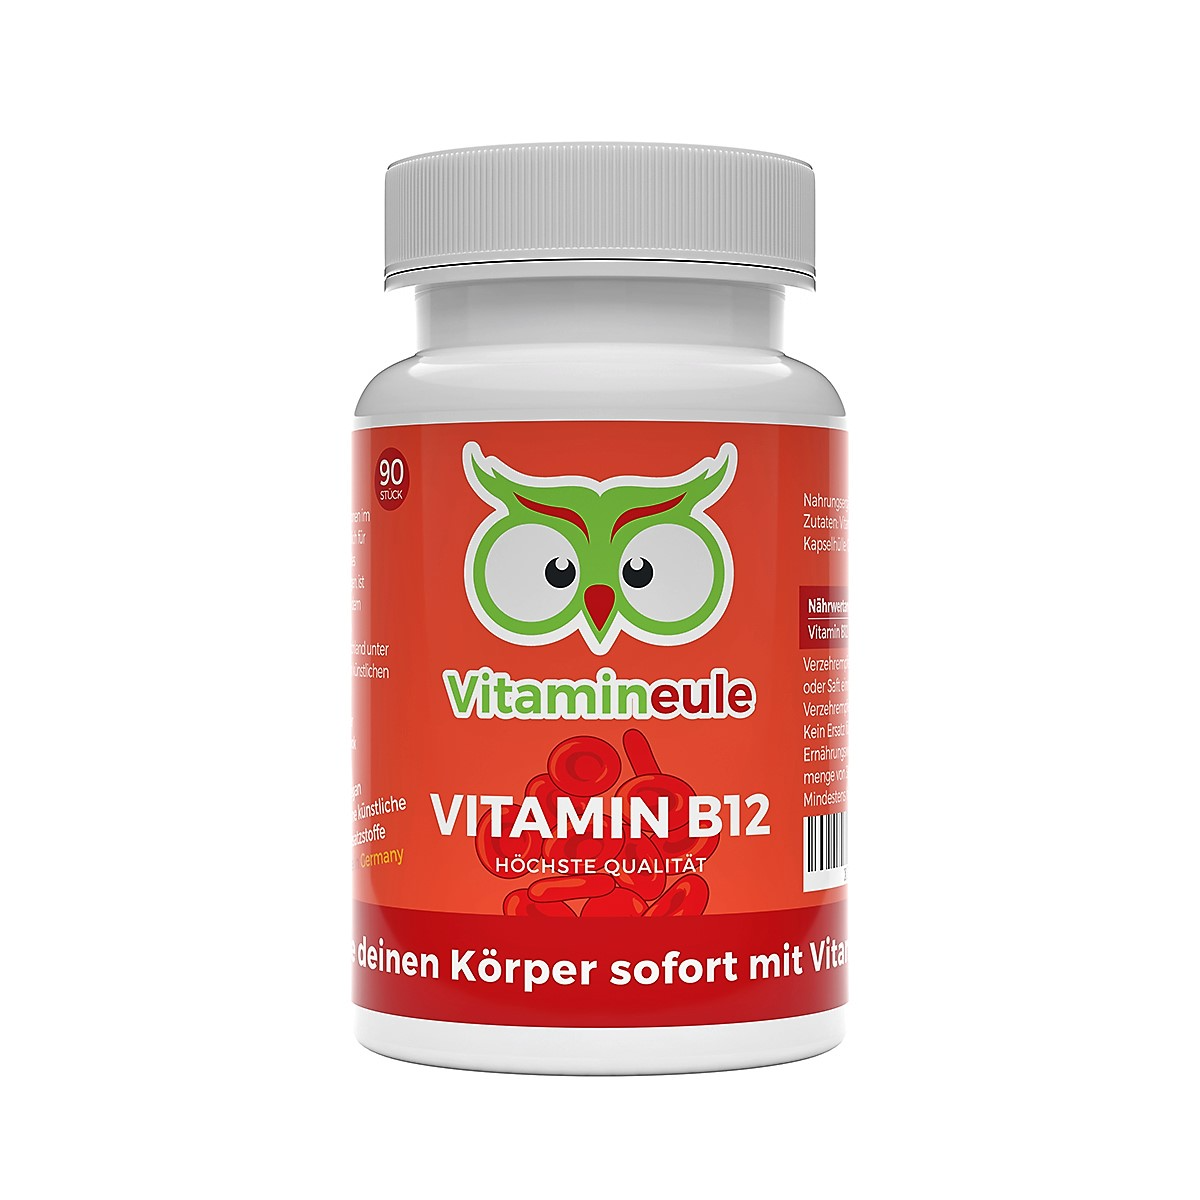 Vitamin B12 Kapseln von Vitamineule